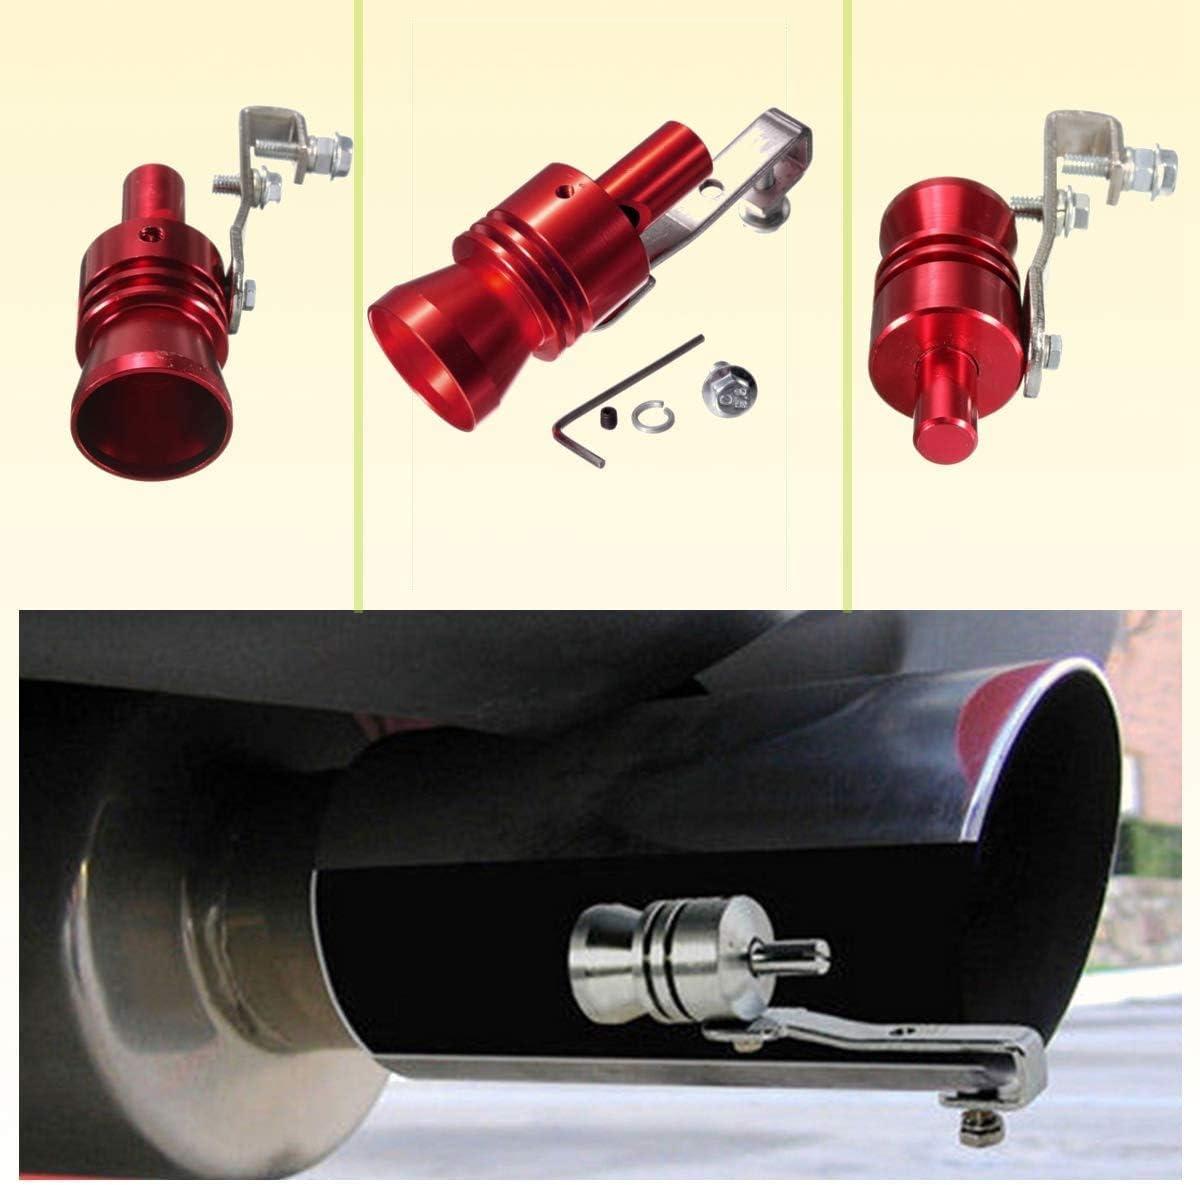 New Multi-Purpose Car Turbo Whistle-Aluminum Turbo Sound Whistle Exhaust Pipe Tailpipe Blow-off Valve Simulator BLACK GR/ÖSSE XL